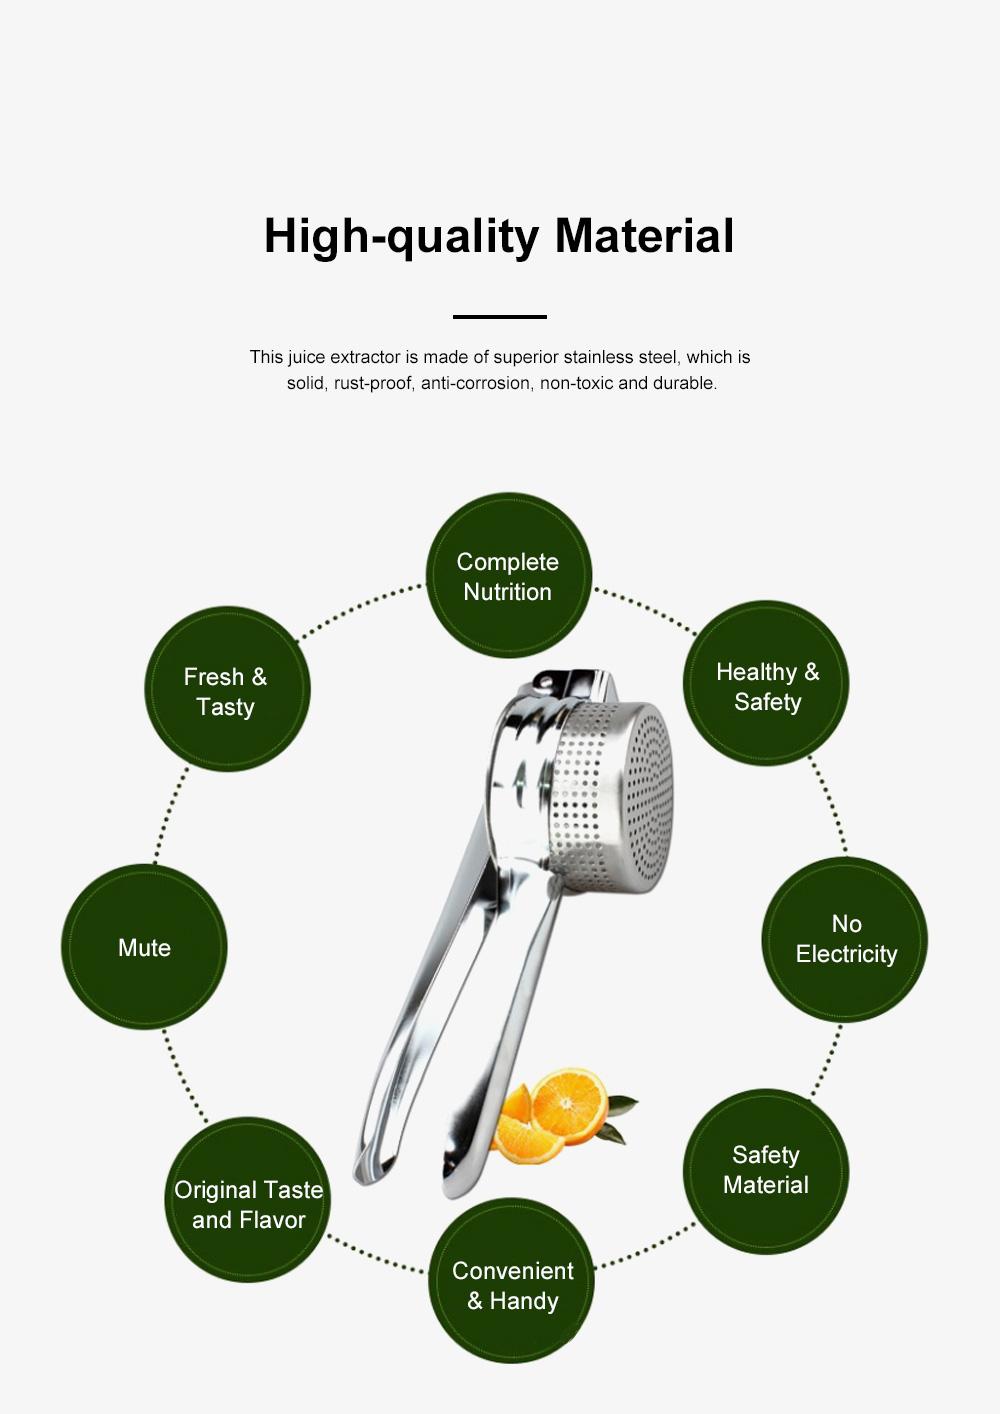 Handy Manual Operation Stainless Steel Juice Extractor Orange Lemon Juicer Garlic Press Kitchen Assistant Tool 5